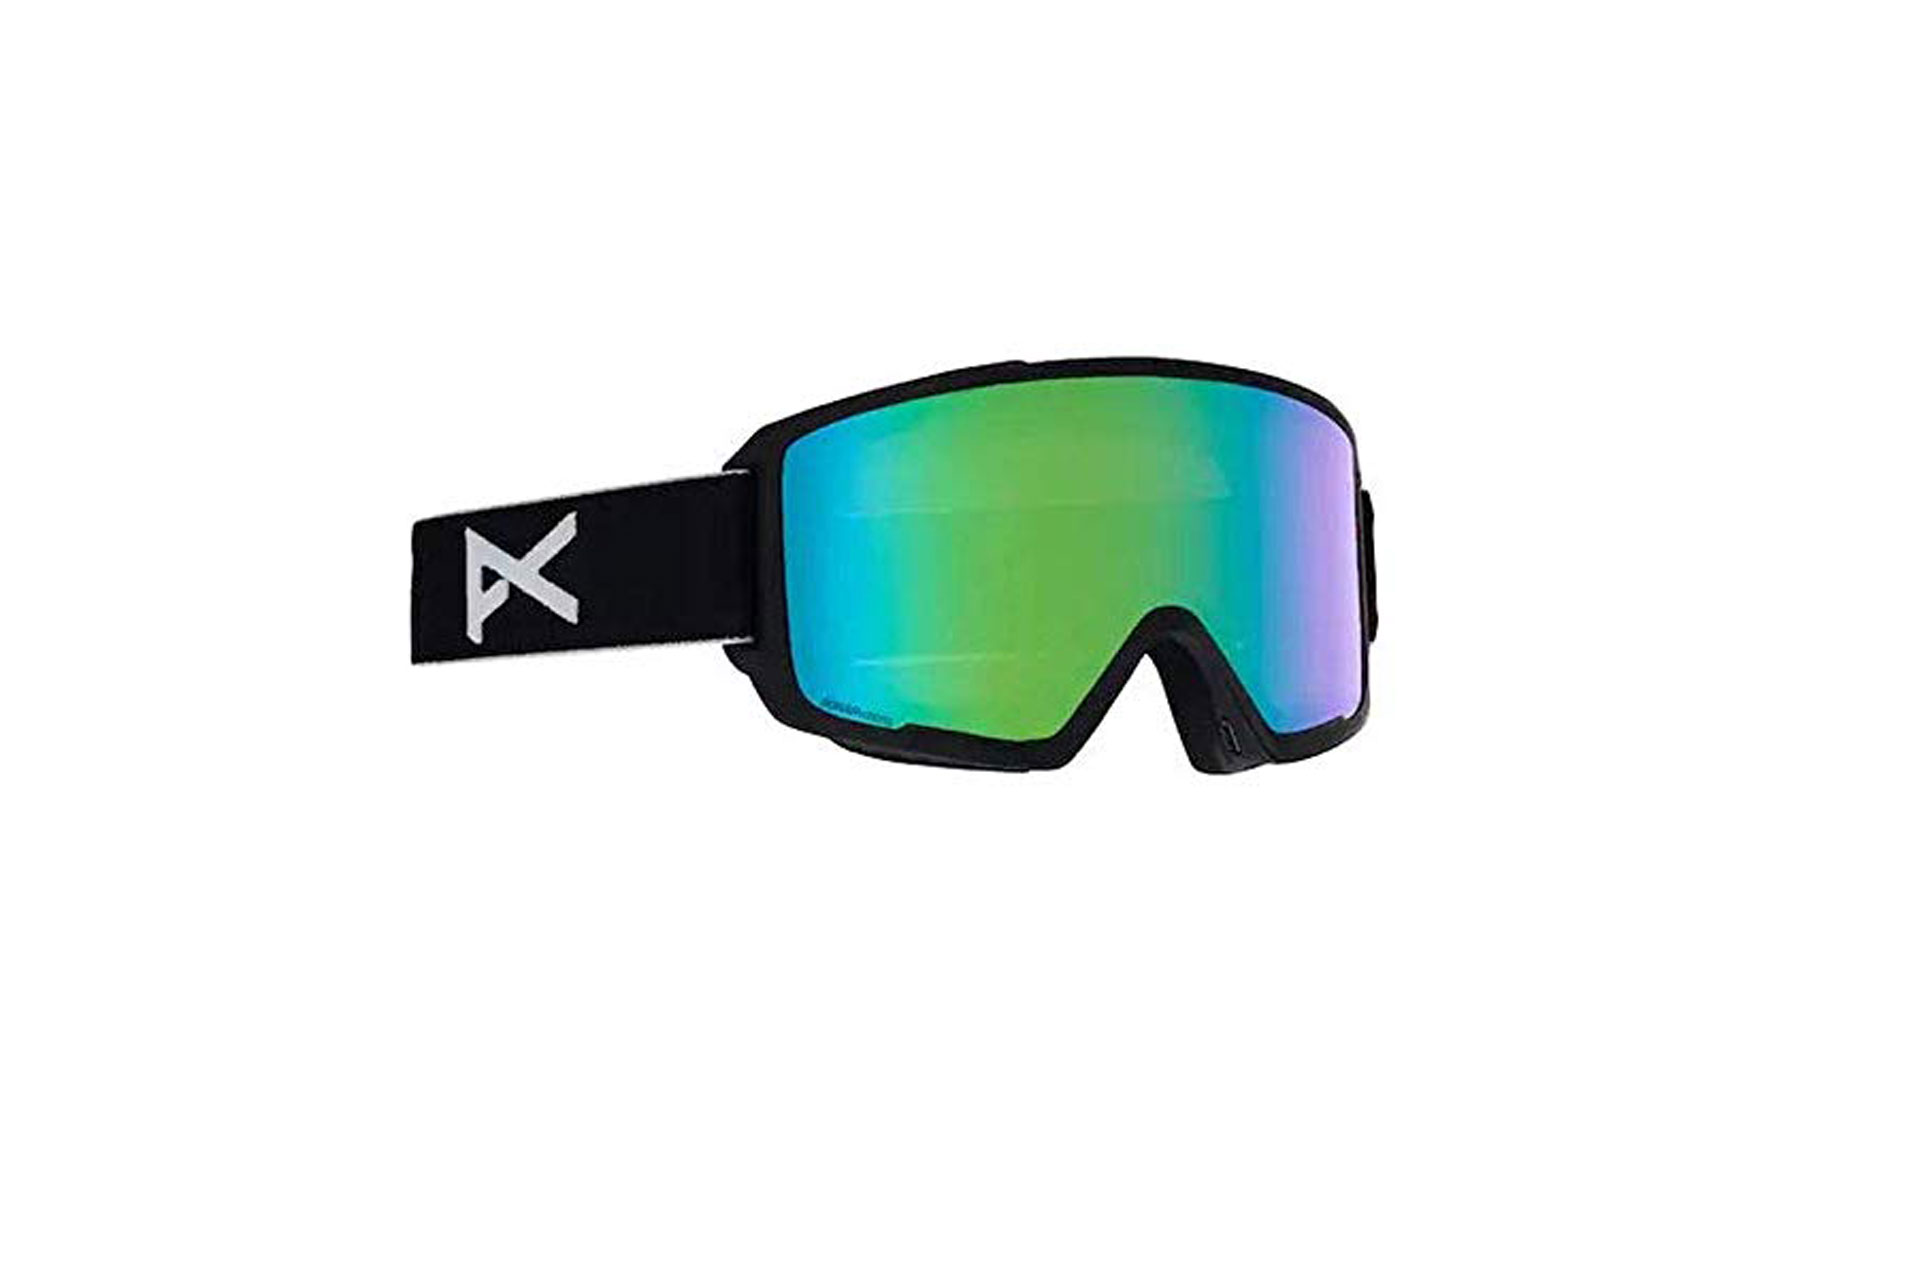 Ski Goggles; Courtesy of Amazon